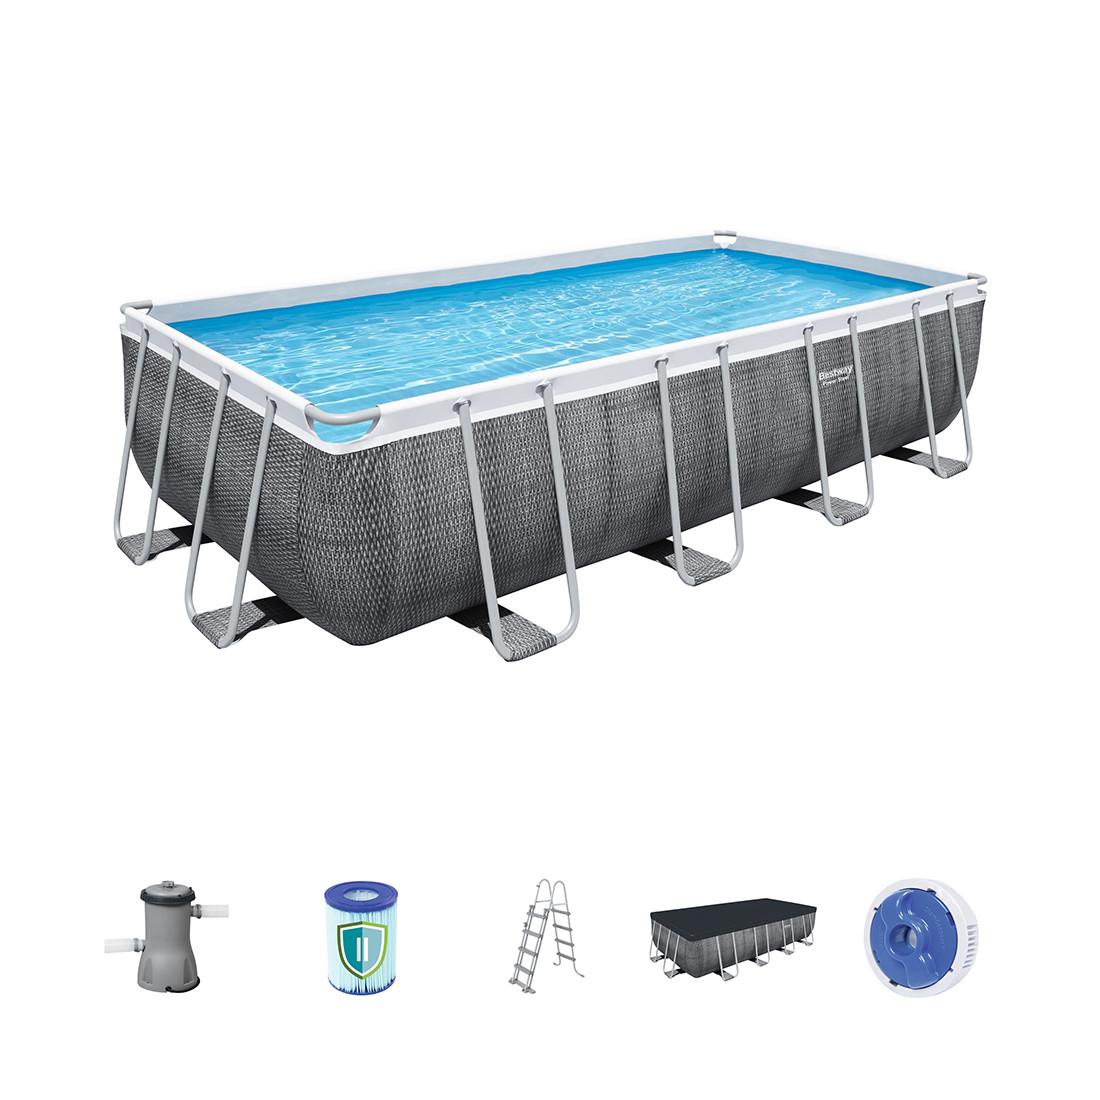 Каркасный бассейн Power Steel Rectangular 488 х 244 х 122 см, BESTWAY, 56996